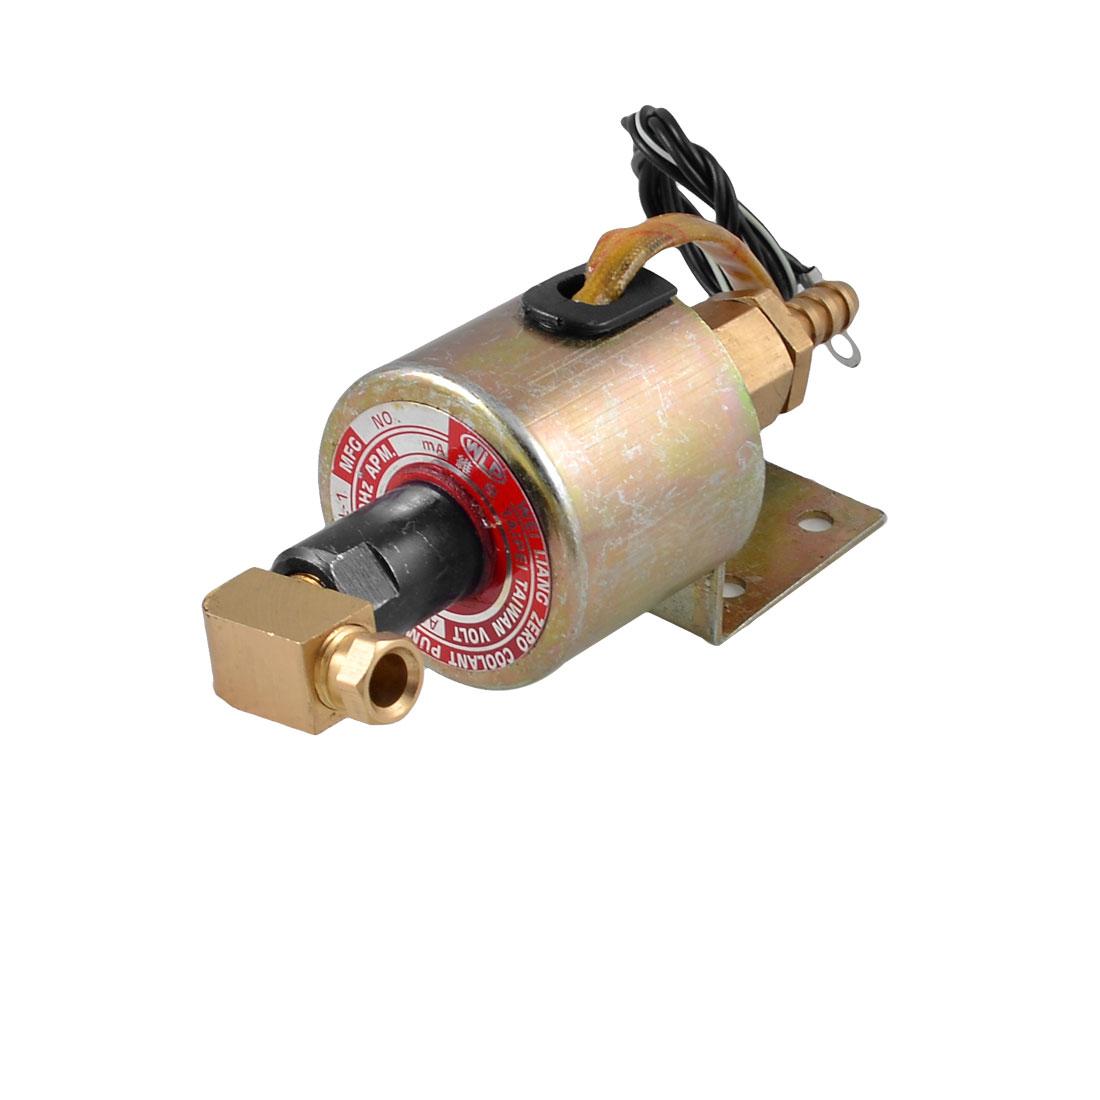 0-24-Female-Thread-Electromagnetic-Magnetic-Drive-Pump-AC-220V-50-60Hz